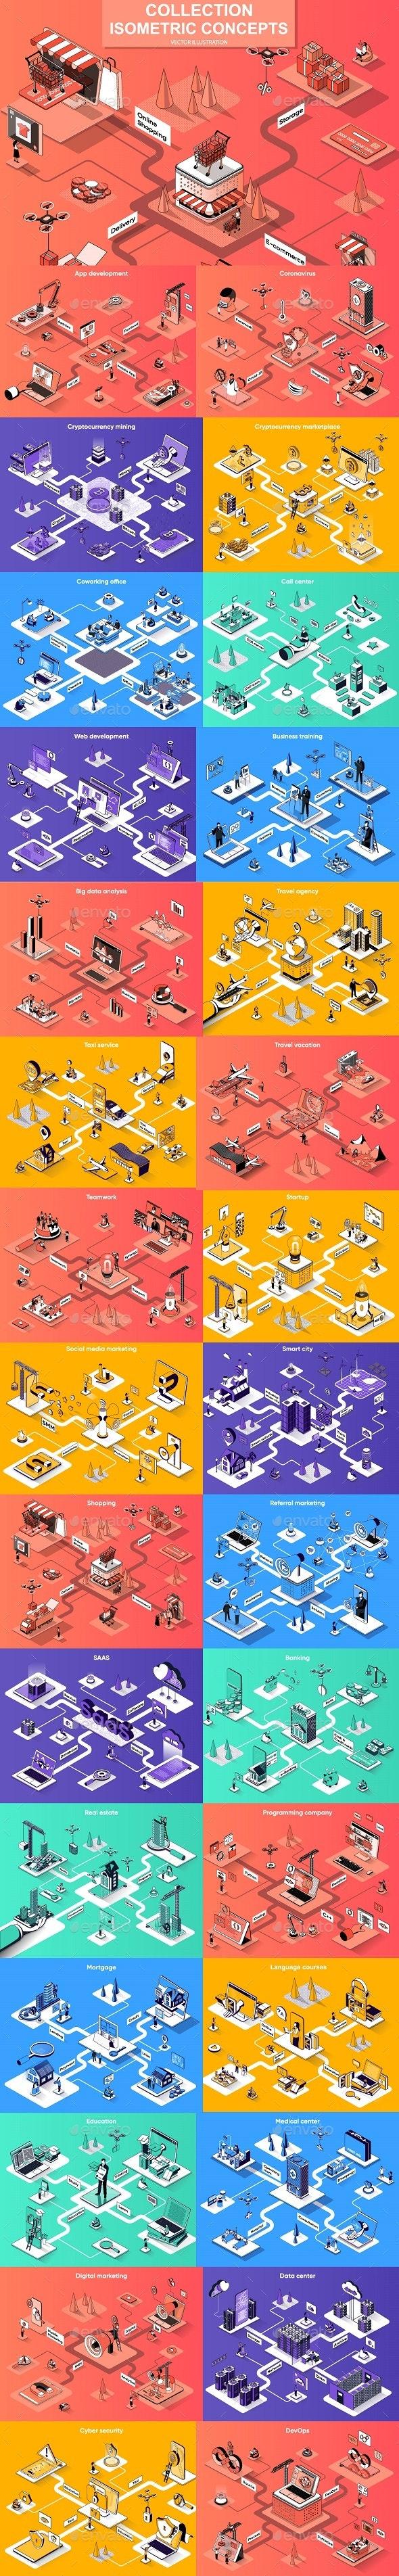 Isometric 3D Vector Illustration Pack - Web Elements Vectors